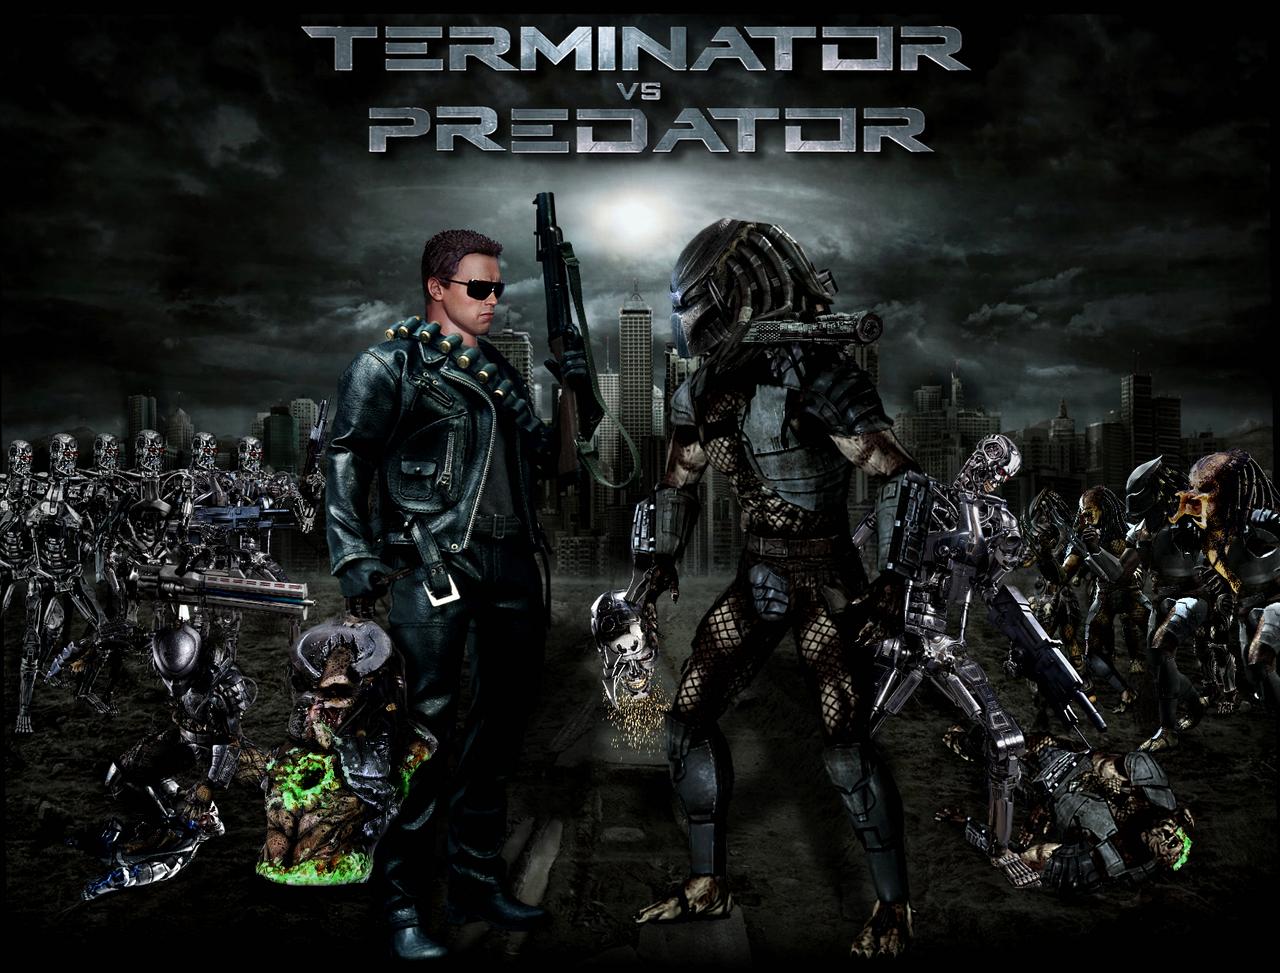 Terminator Vs Predator